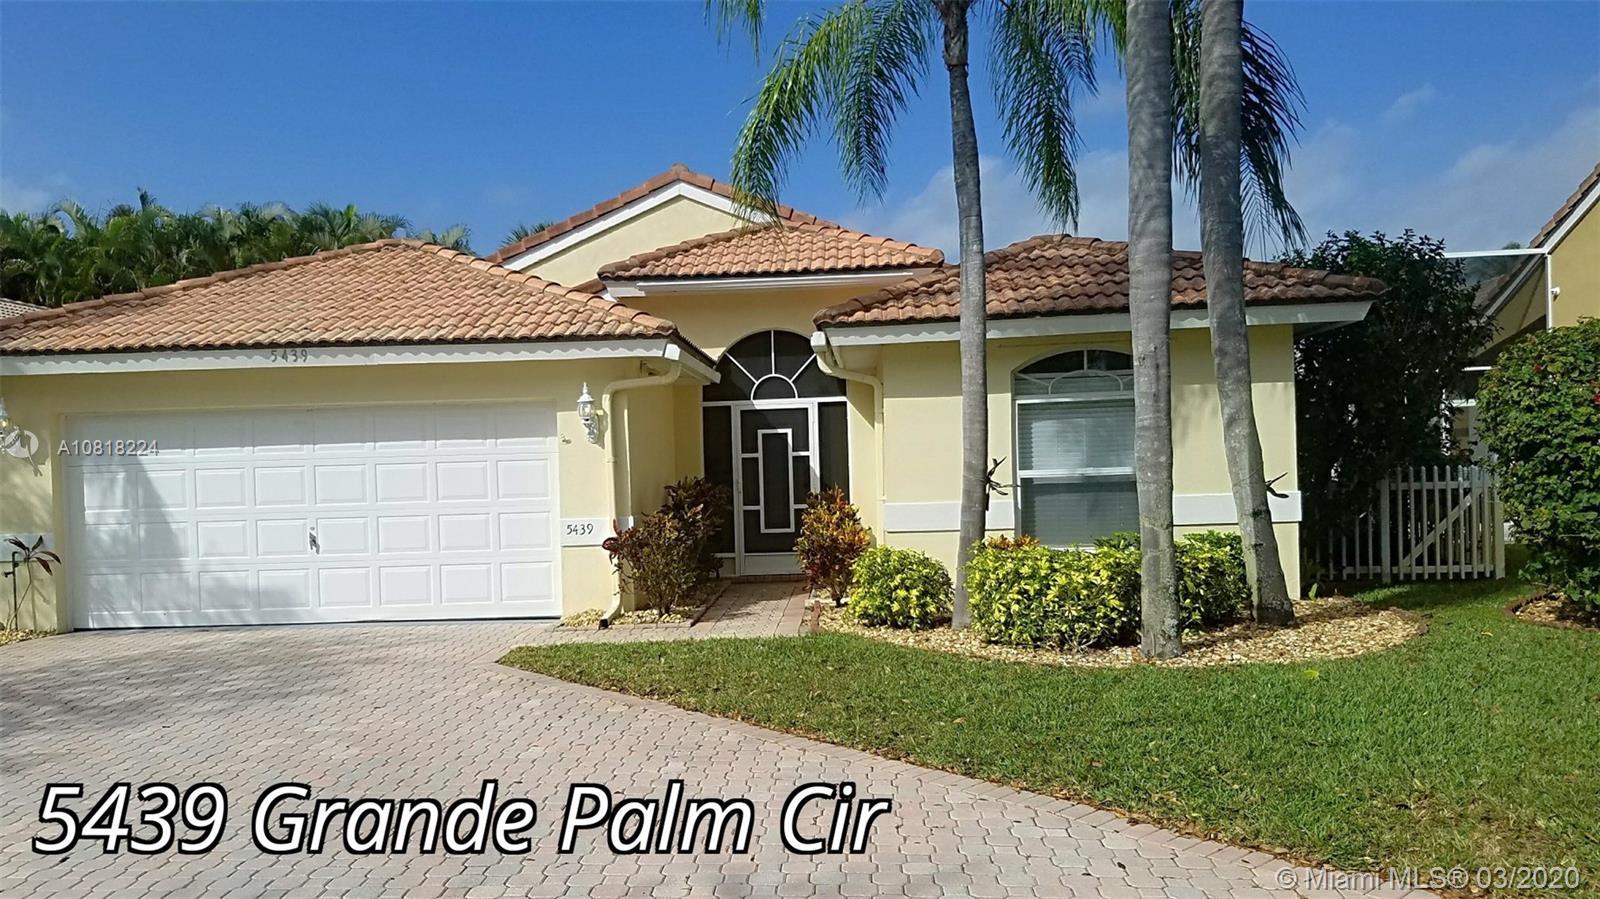 5439 Grande Palm Cir, Delray Beach, FL 33484 - Delray Beach, FL real estate listing